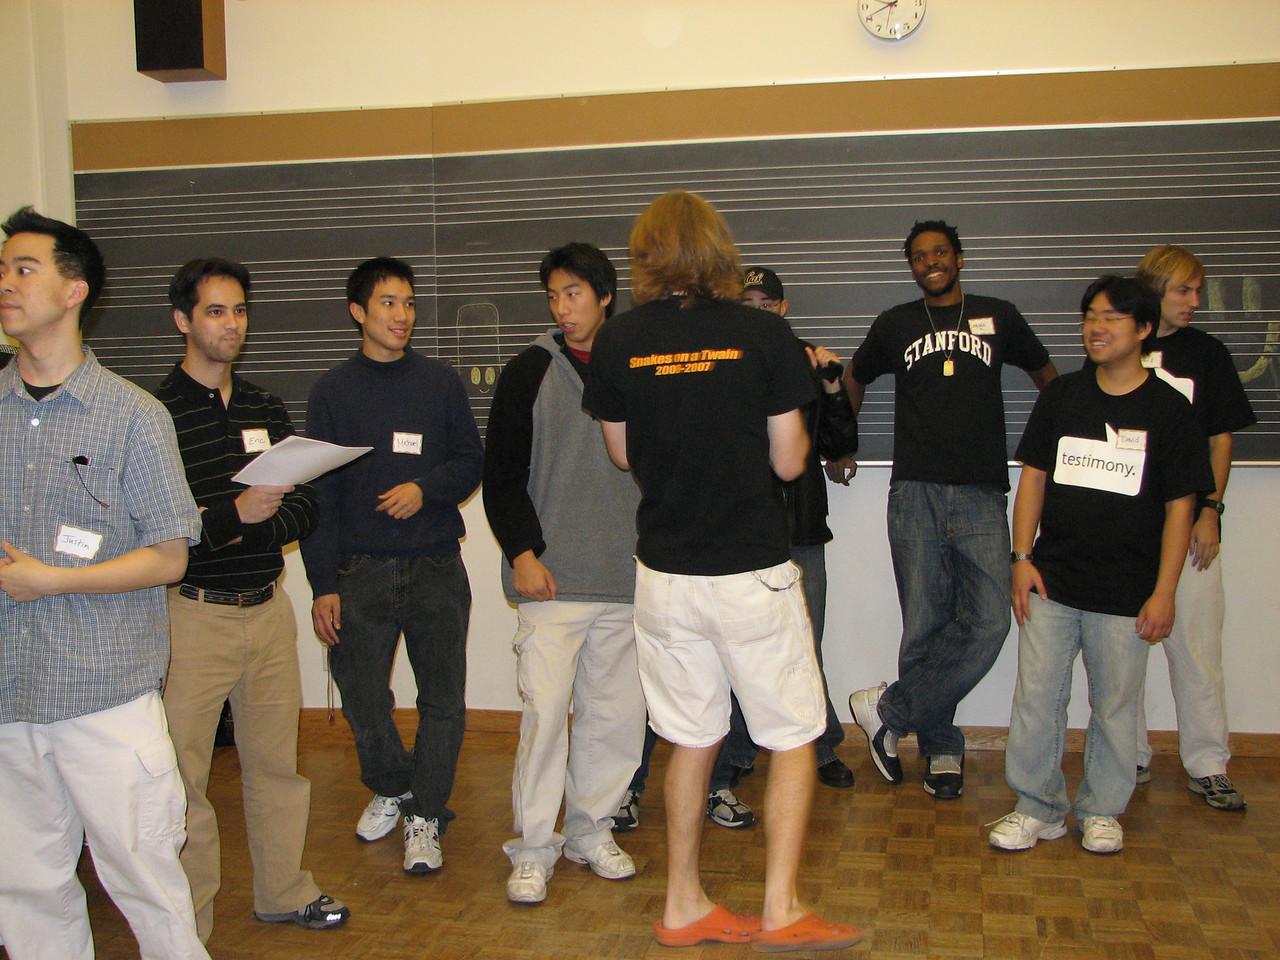 2006 12 02 Sat - Old Tmony basses & tenors practice